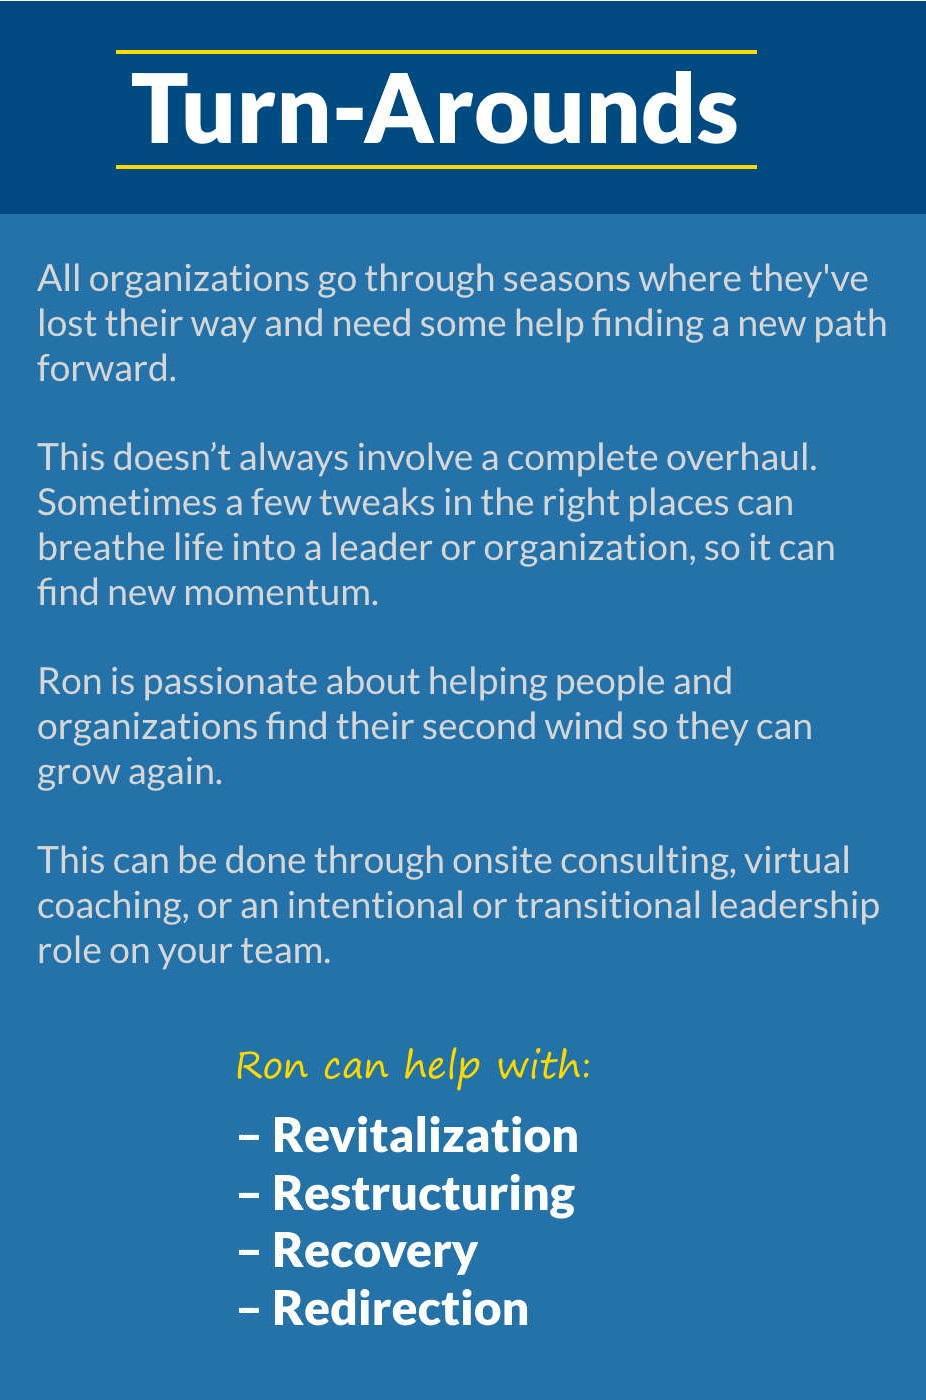 5T Leadership - Turnarounds